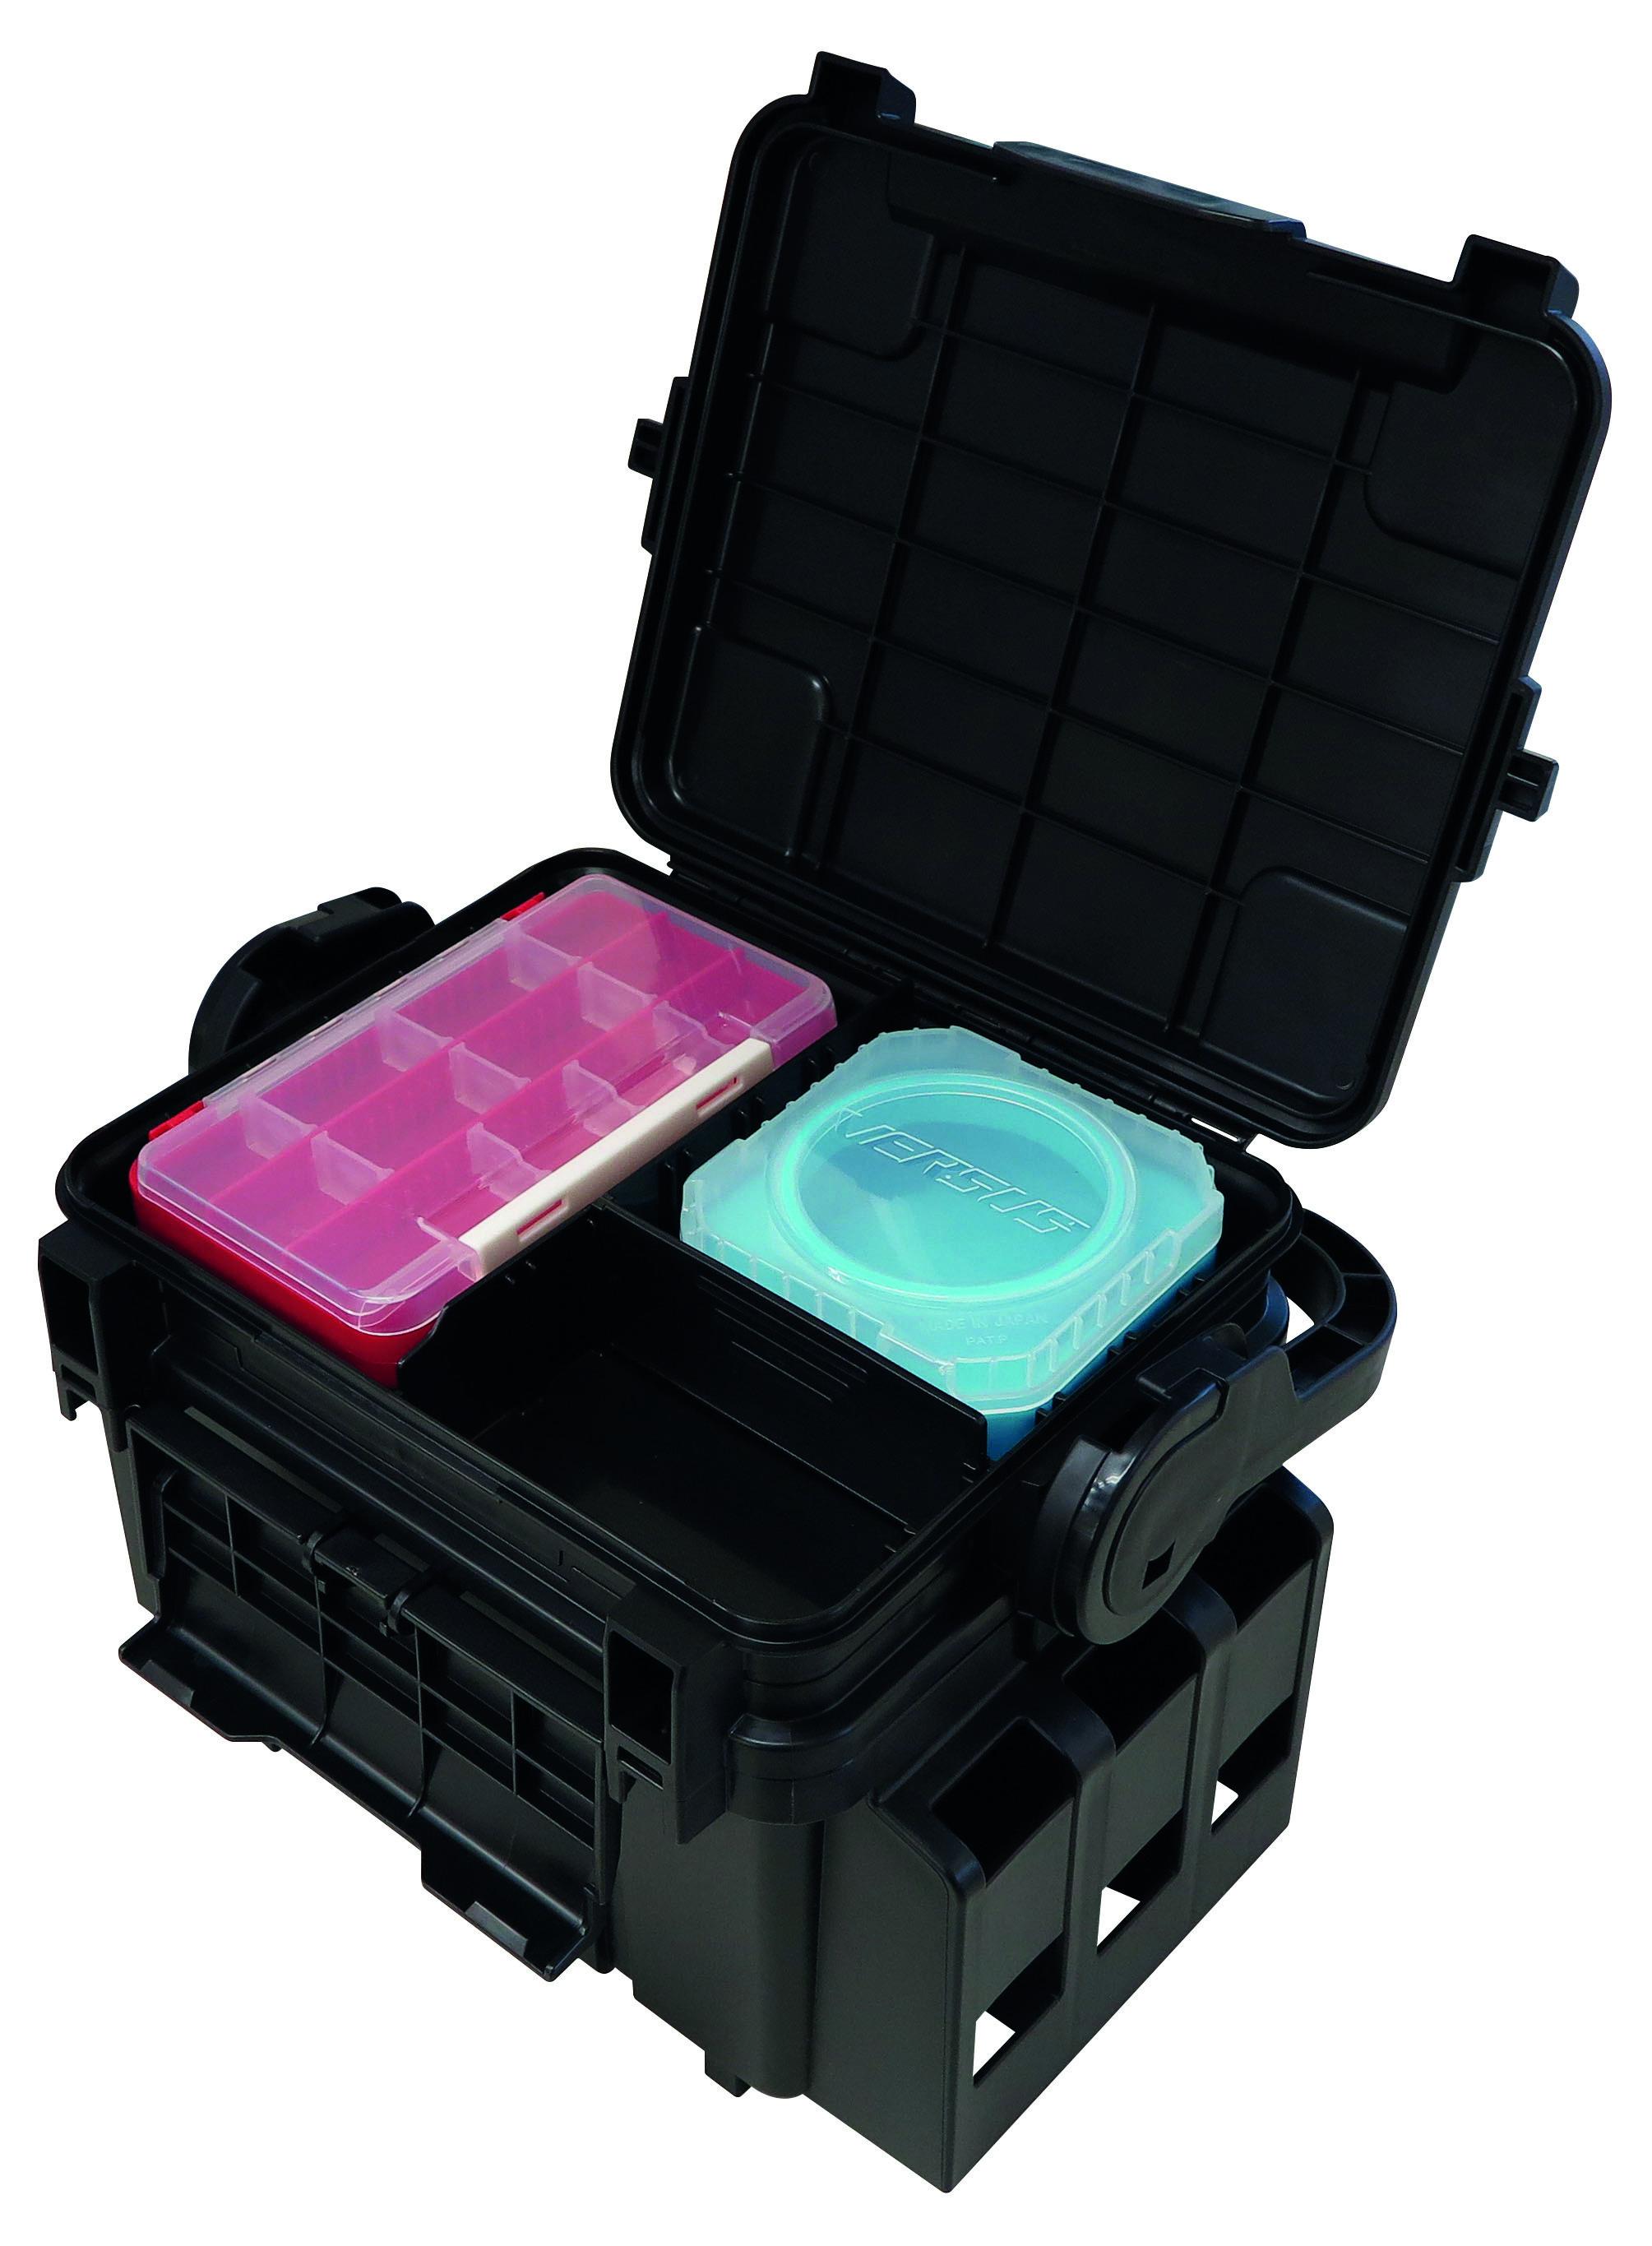 Vorschau: VS 7055 Forellenbox